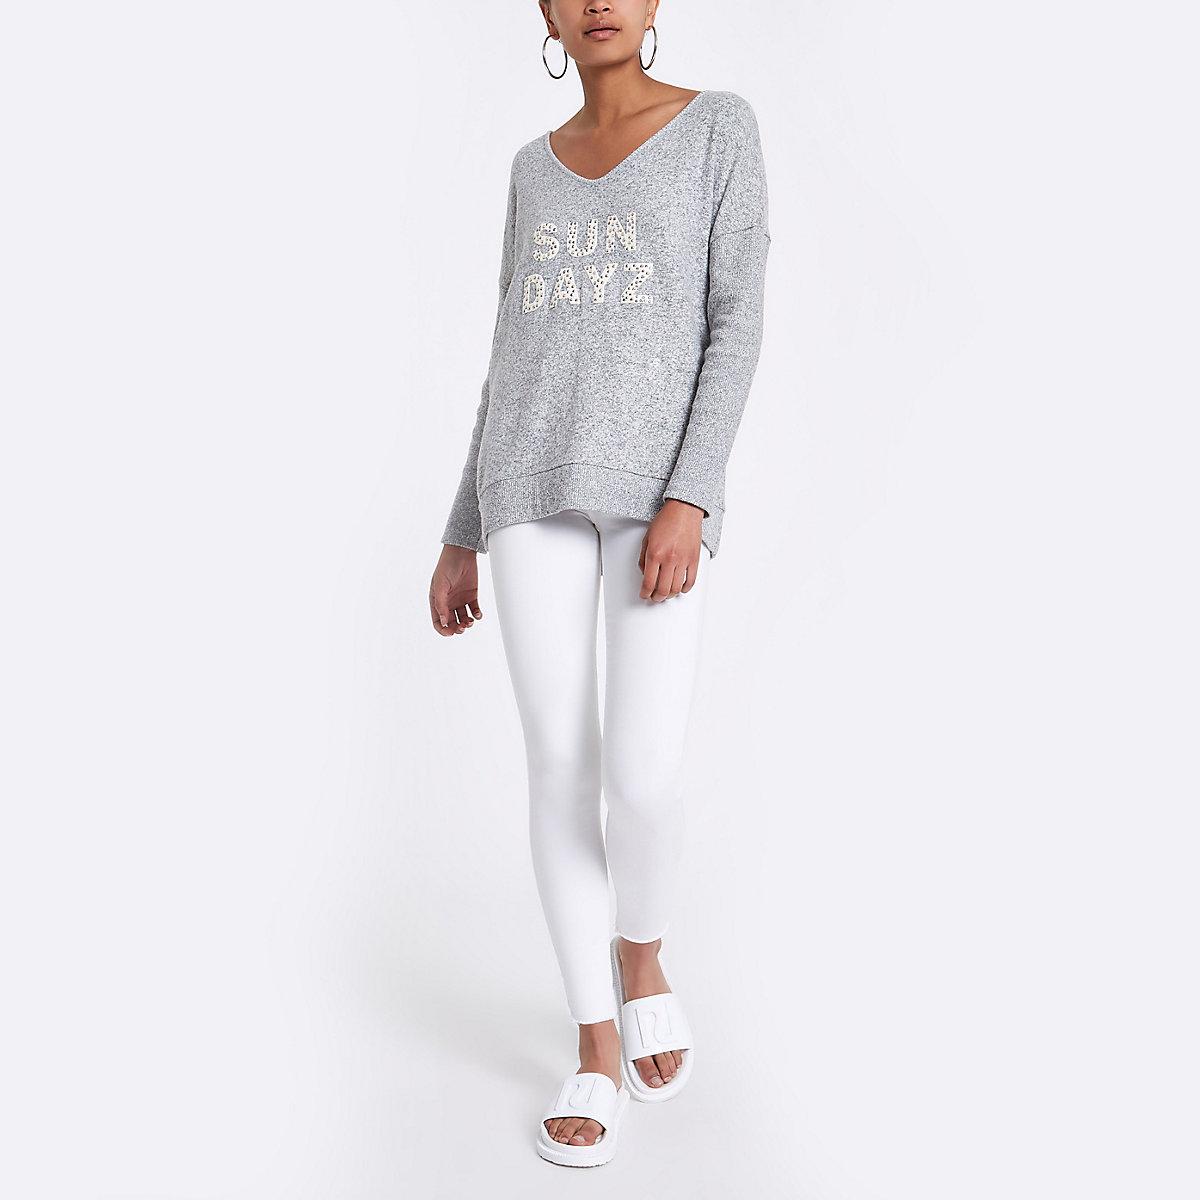 Grey 'Sun dayz' slouch jumper